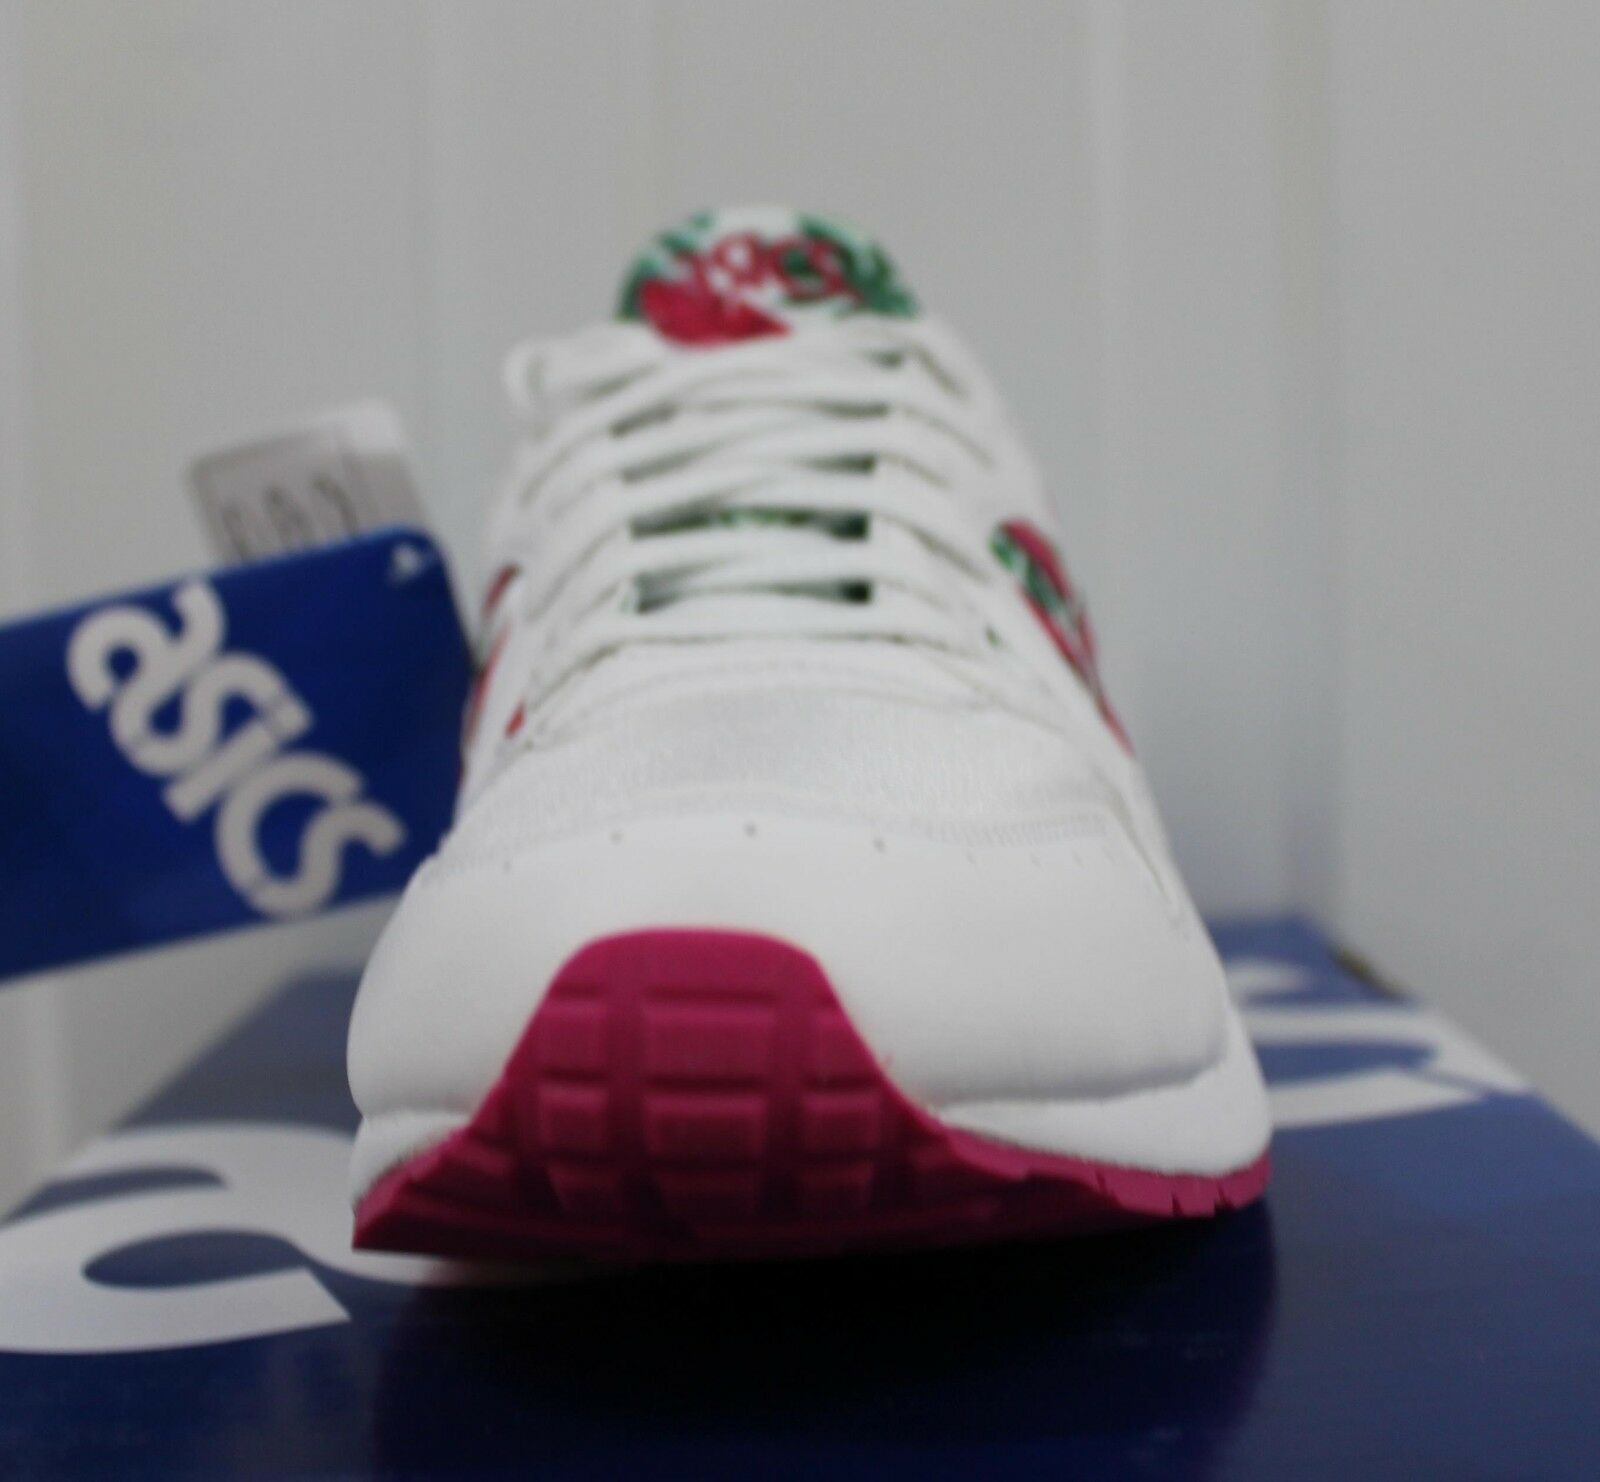 Les femmes, V S/GIRL, S ASICS GEL-LYTE V femmes, GS Blanc Rose Running Baskets Entièrement neuf dans sa boîte 20 49ceec